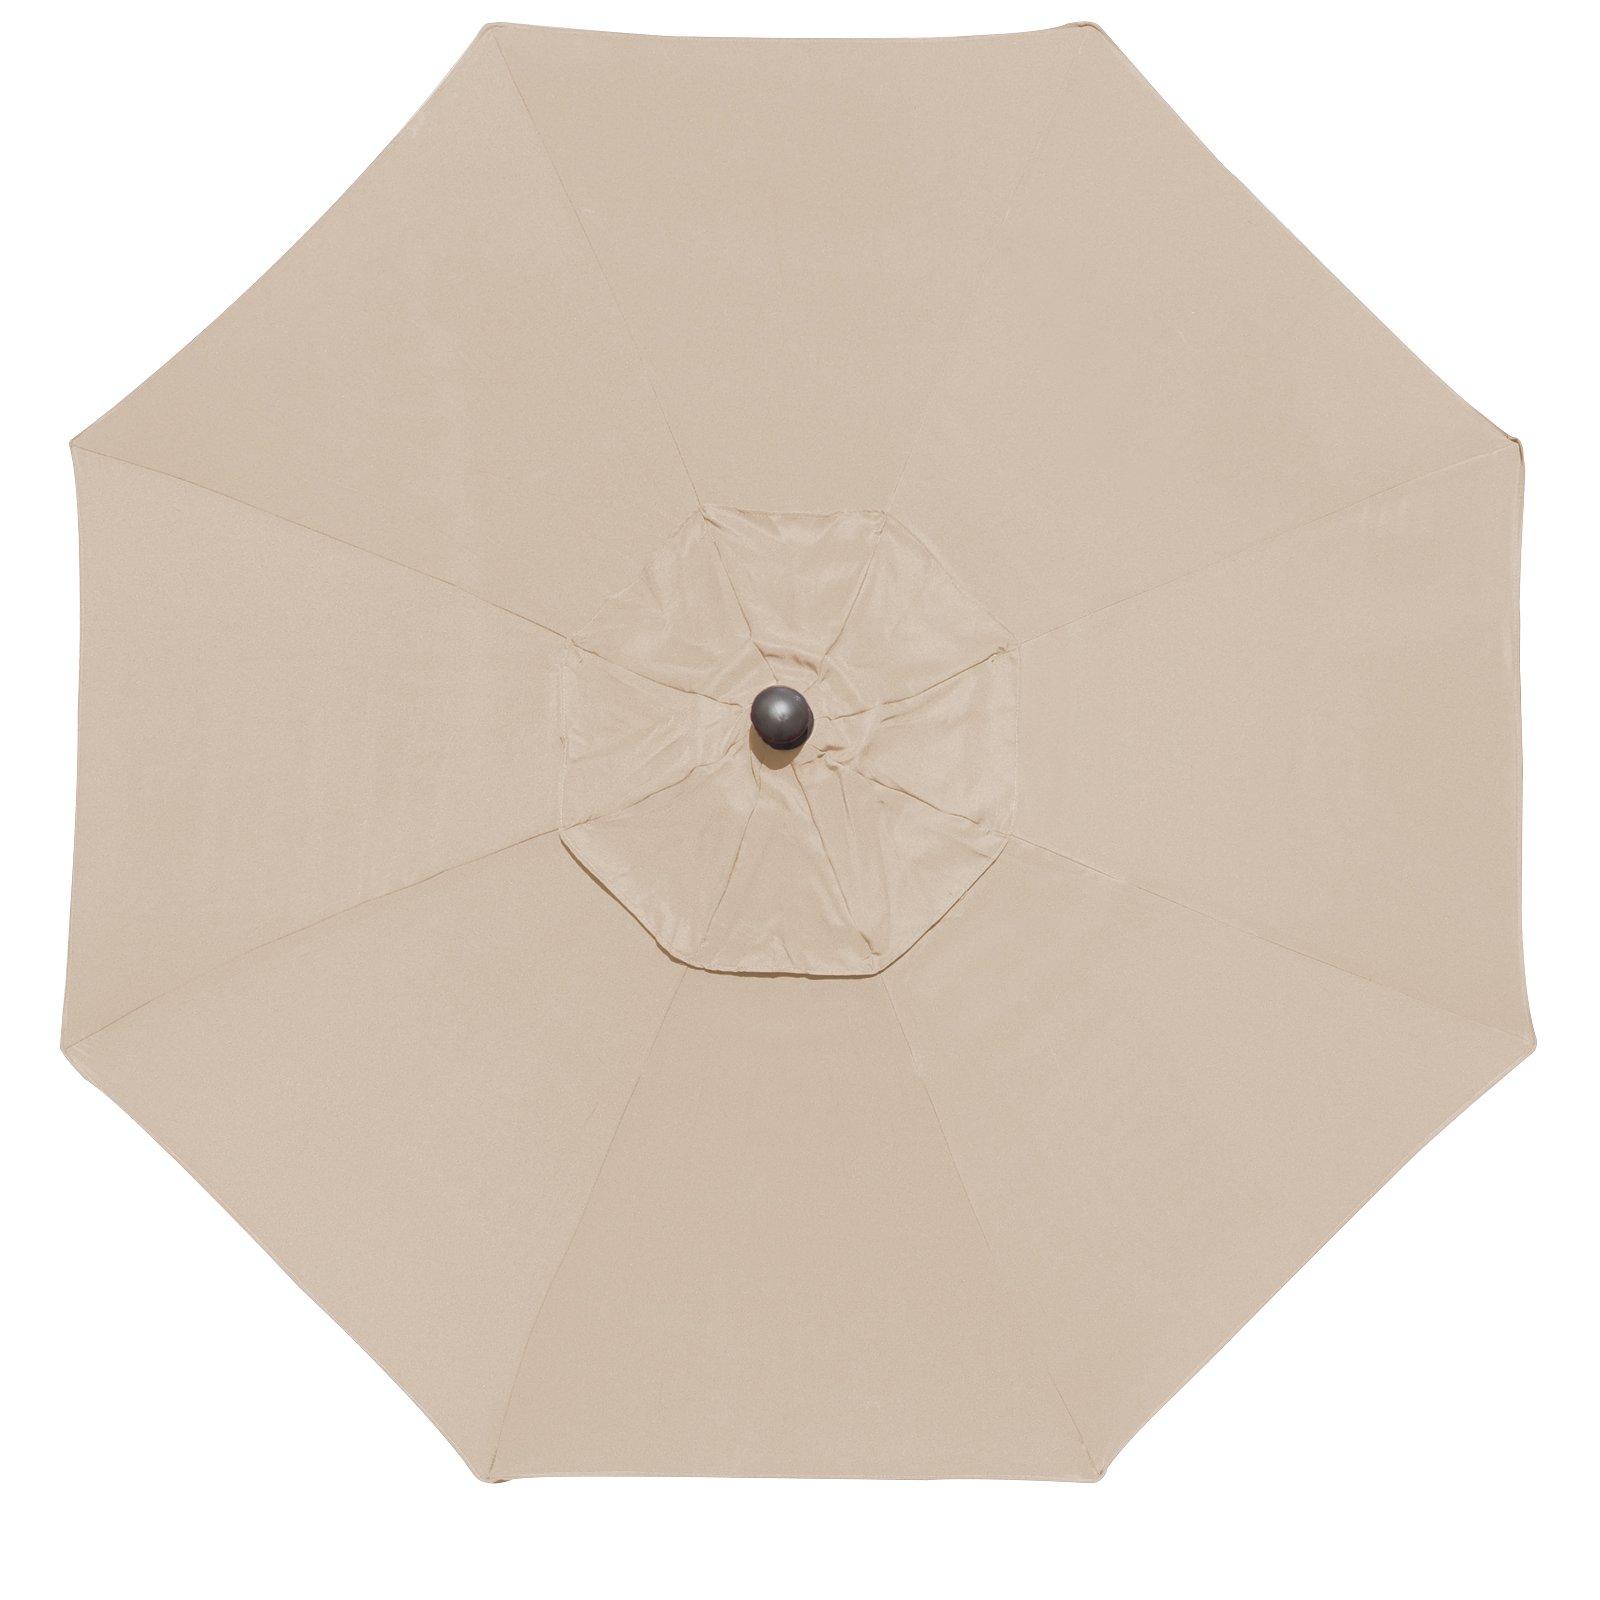 Eliteshade 9ft Patio Umbrella Market Table Outdoor Umbrella